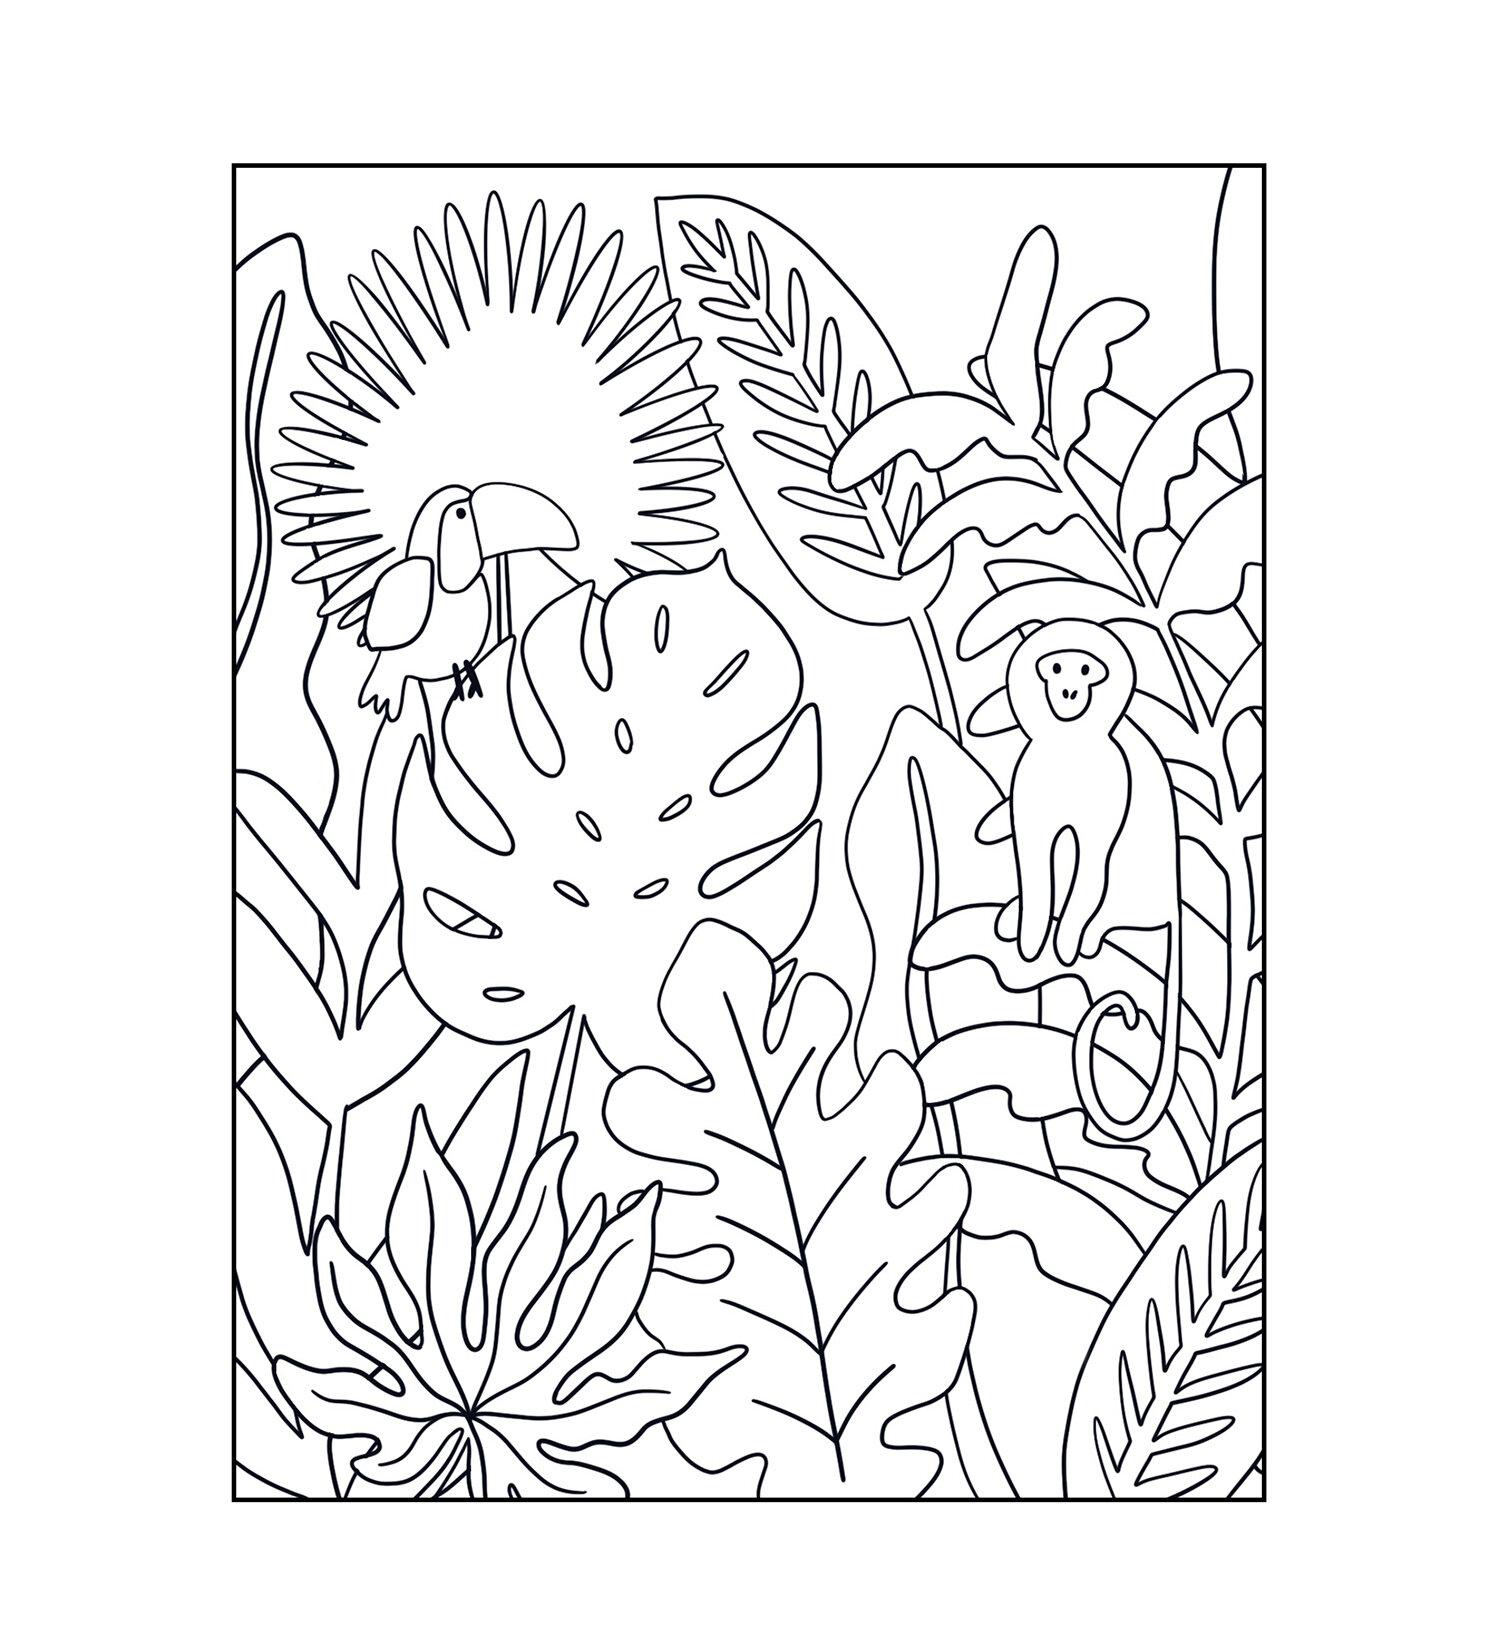 FREE Coloring Pages — Meg Biram